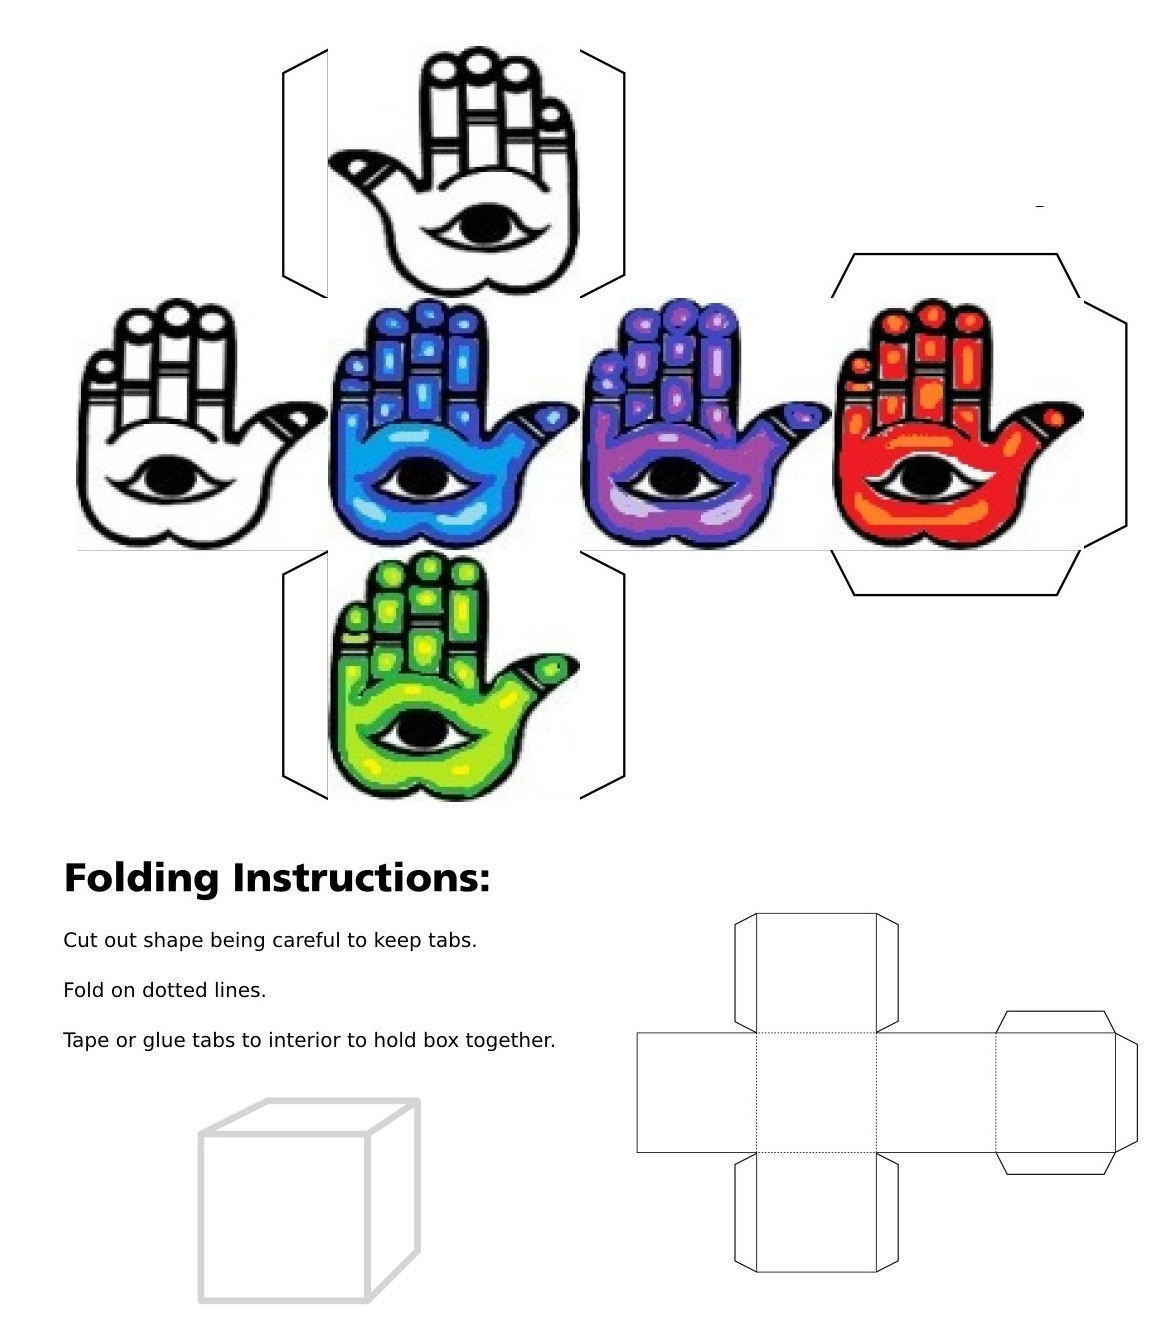 3D cube, dice, Eye of Fatima, Left Eye of Fatima, Blue Eye of Fatima, Green Eye of Fatima, Purple Eye of Fatima, Red Eye of Fatima, Hamsa, Blue Hamsa, Green Hamsa, Purple Hamsa, Red Hamsa